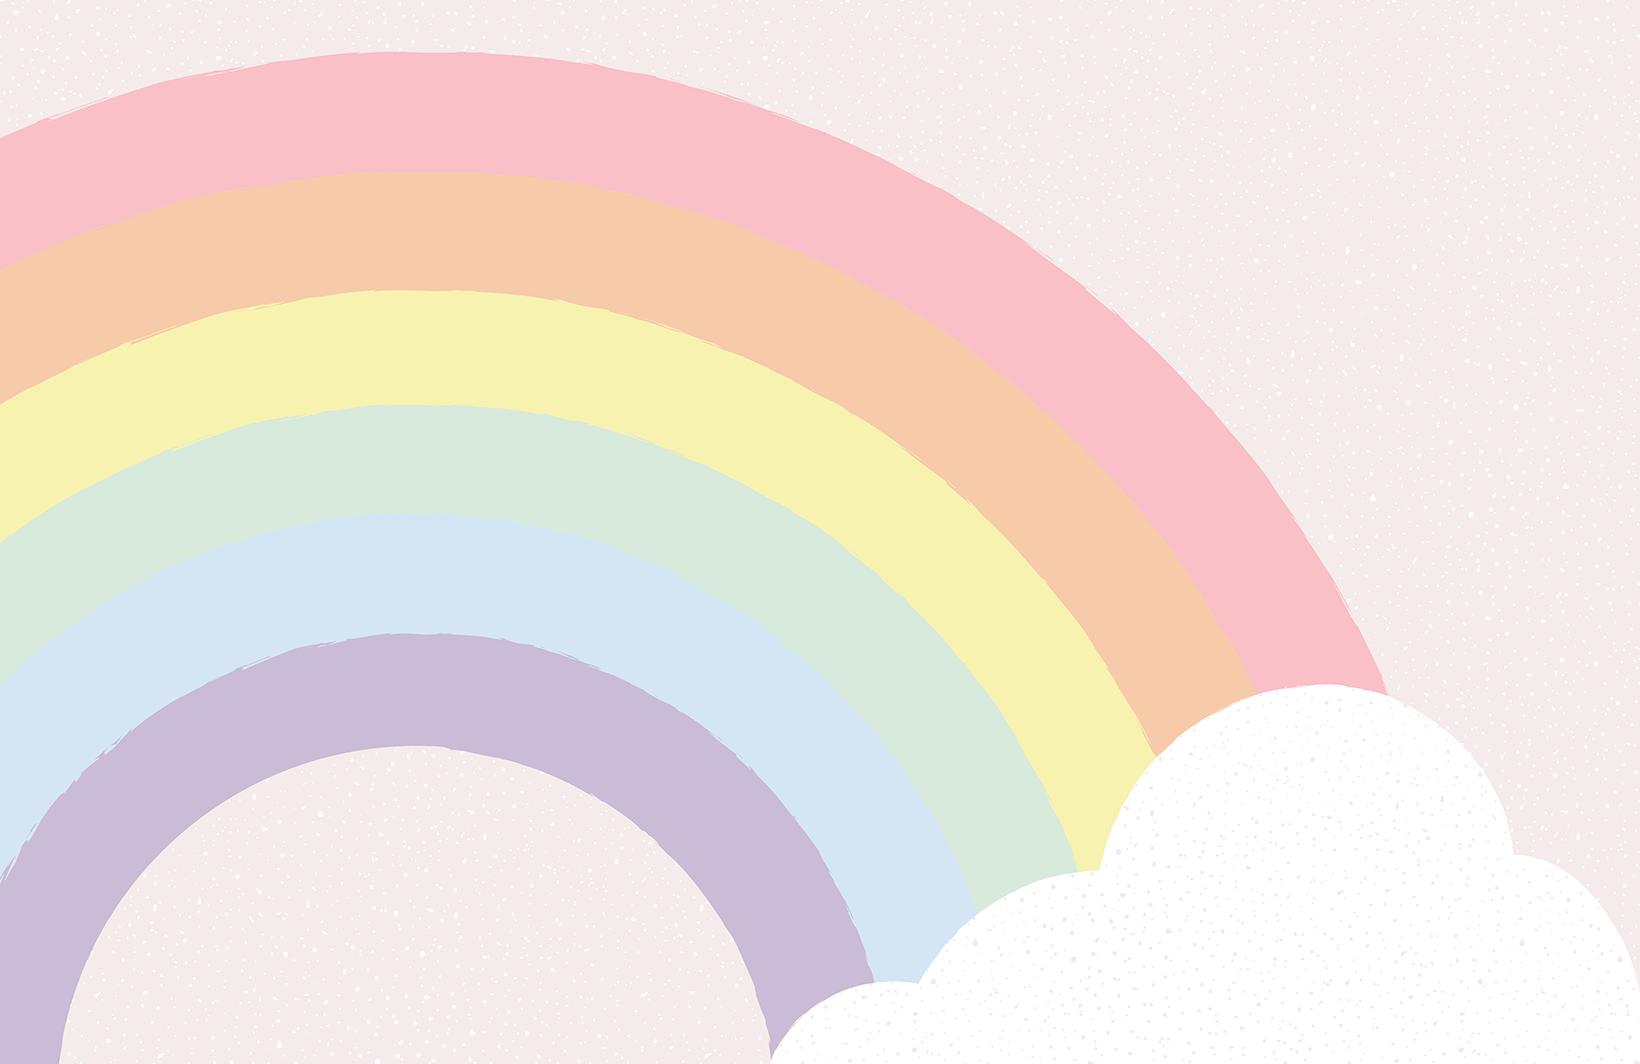 Kids Pastel Rainbow Wallpaper Mural Murals Wallpaper In 2020 Rainbow Wallpaper Rainbow Bedroom Pastel Rainbow